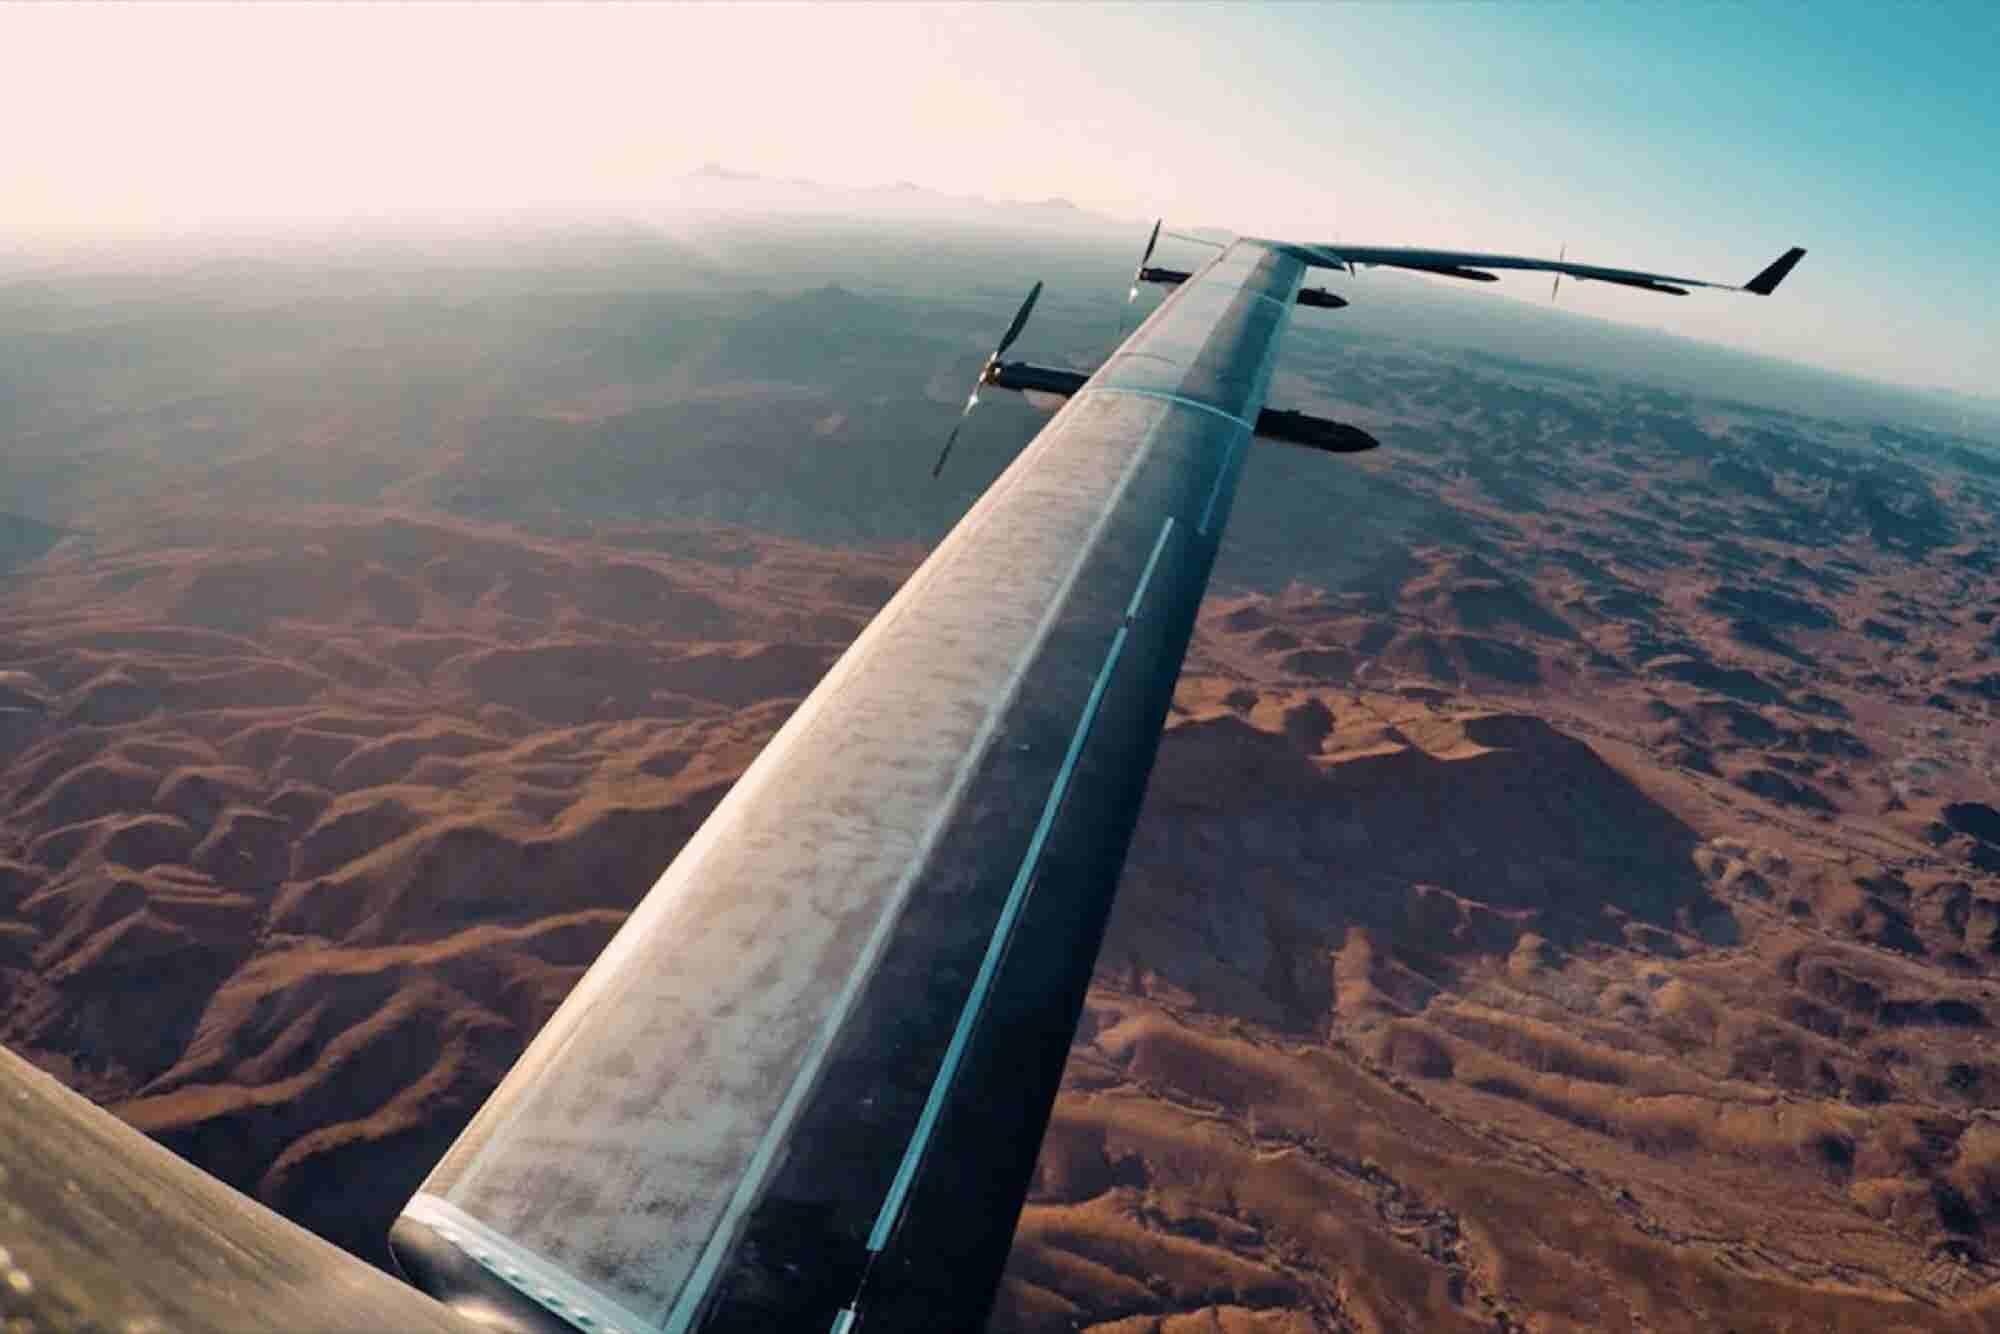 Facebook Drone Failure Prompts a U.S. Investigation